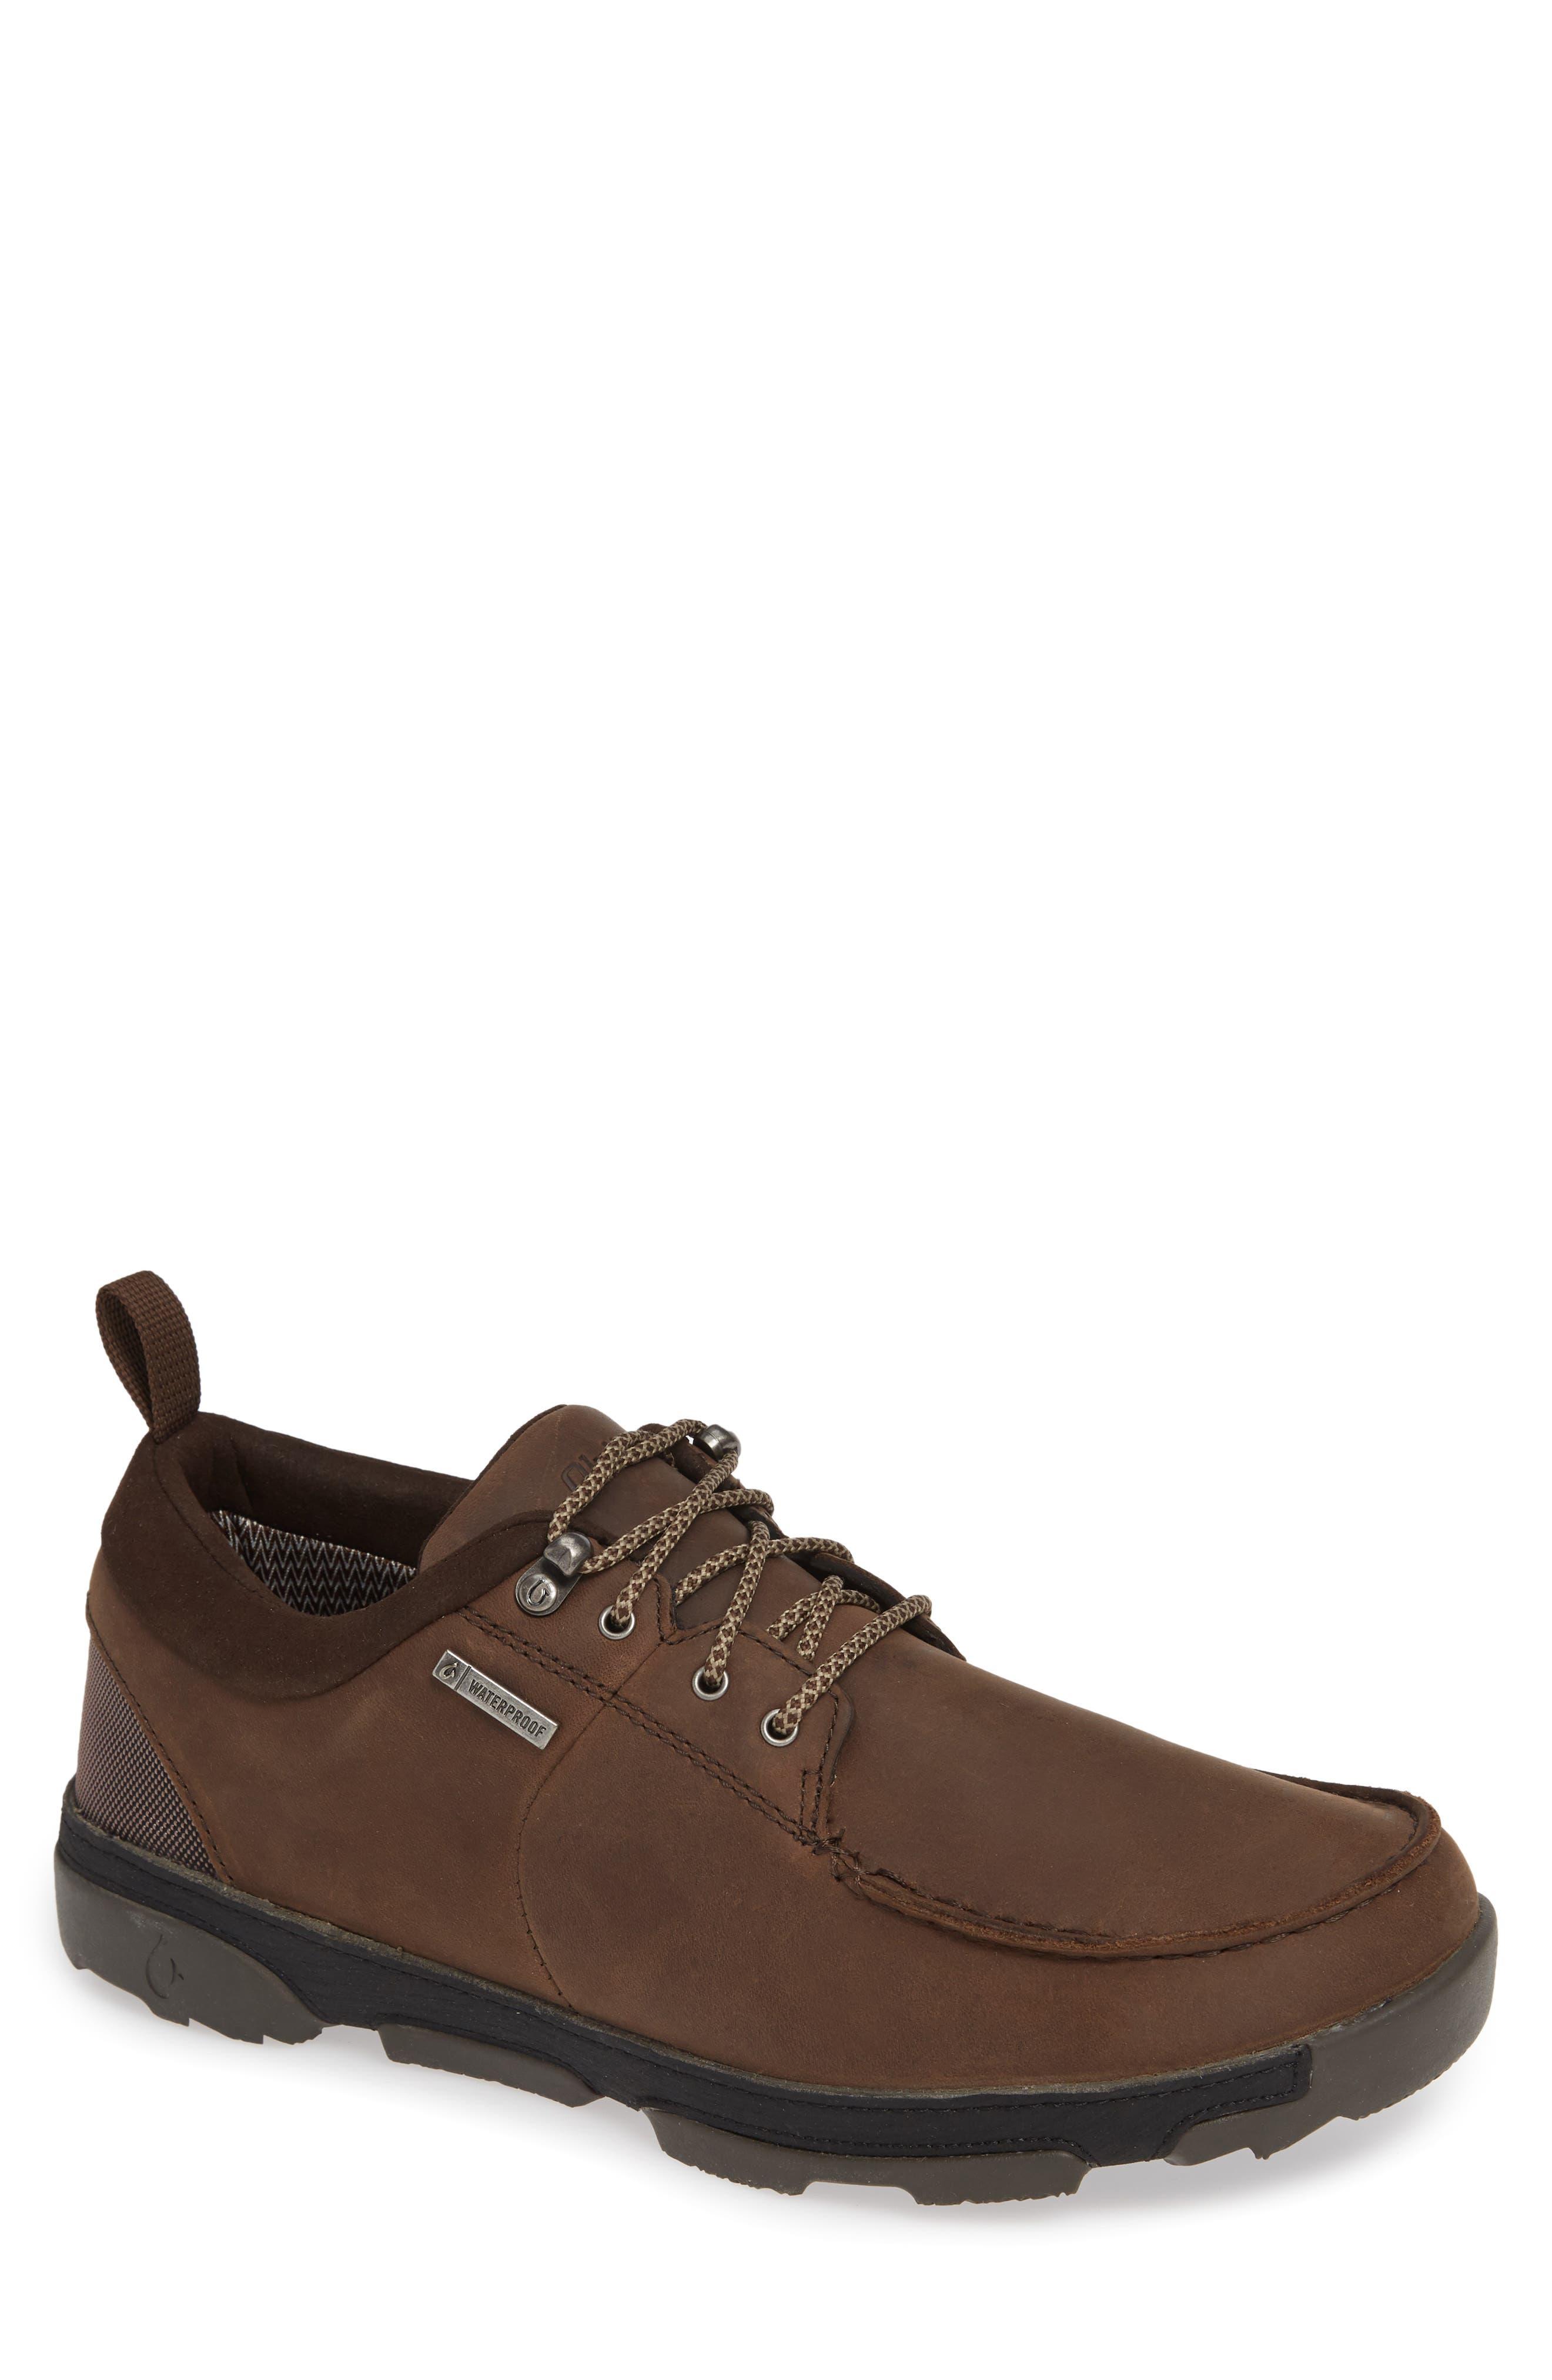 Makoa Waterproof Shoe,                         Main,                         color, ESPRESSO/ BLACK LEATHER